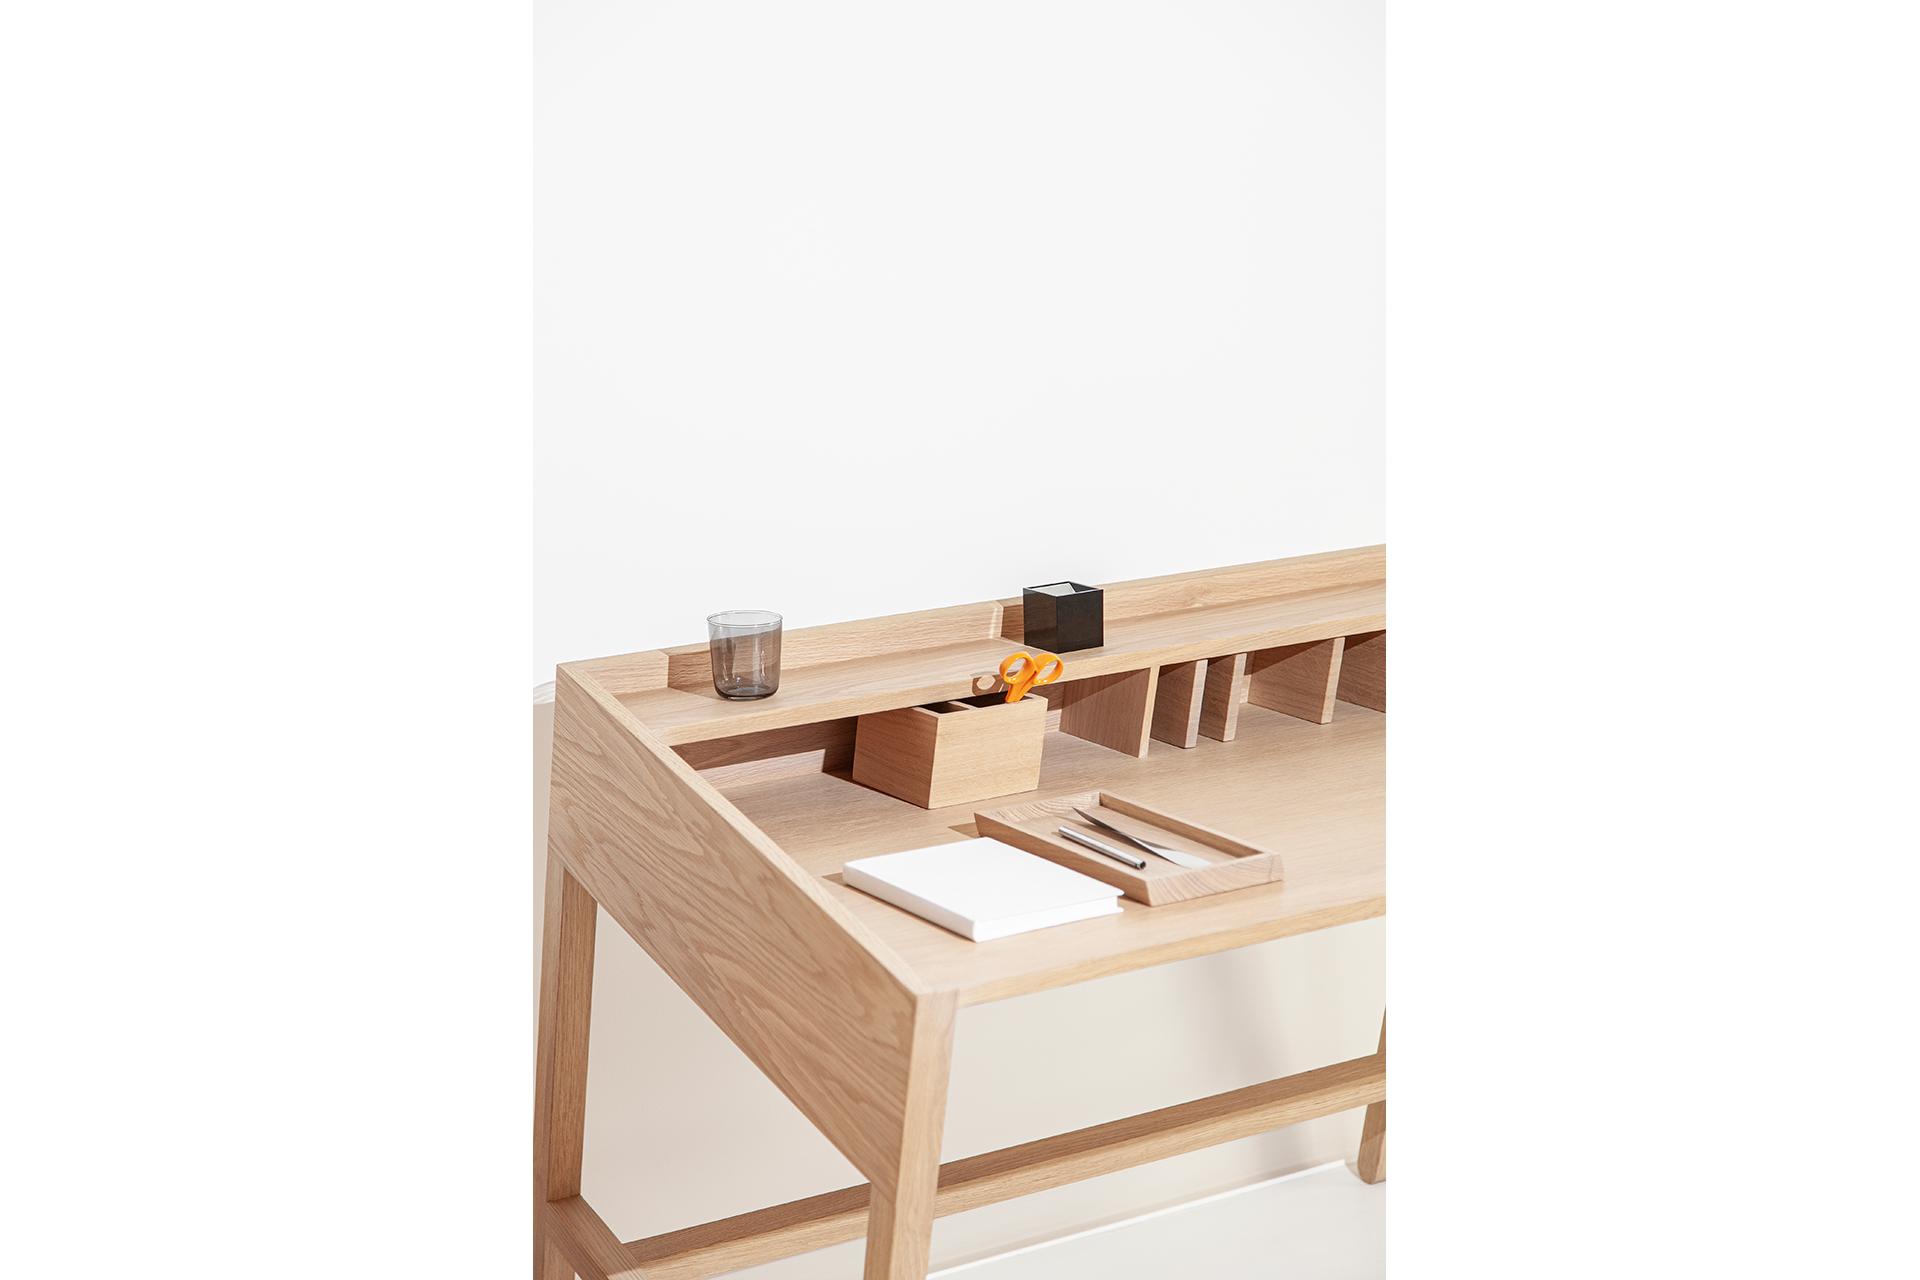 Torta Desk Upper view - DESIGN BY MIGUEL SOEIRO